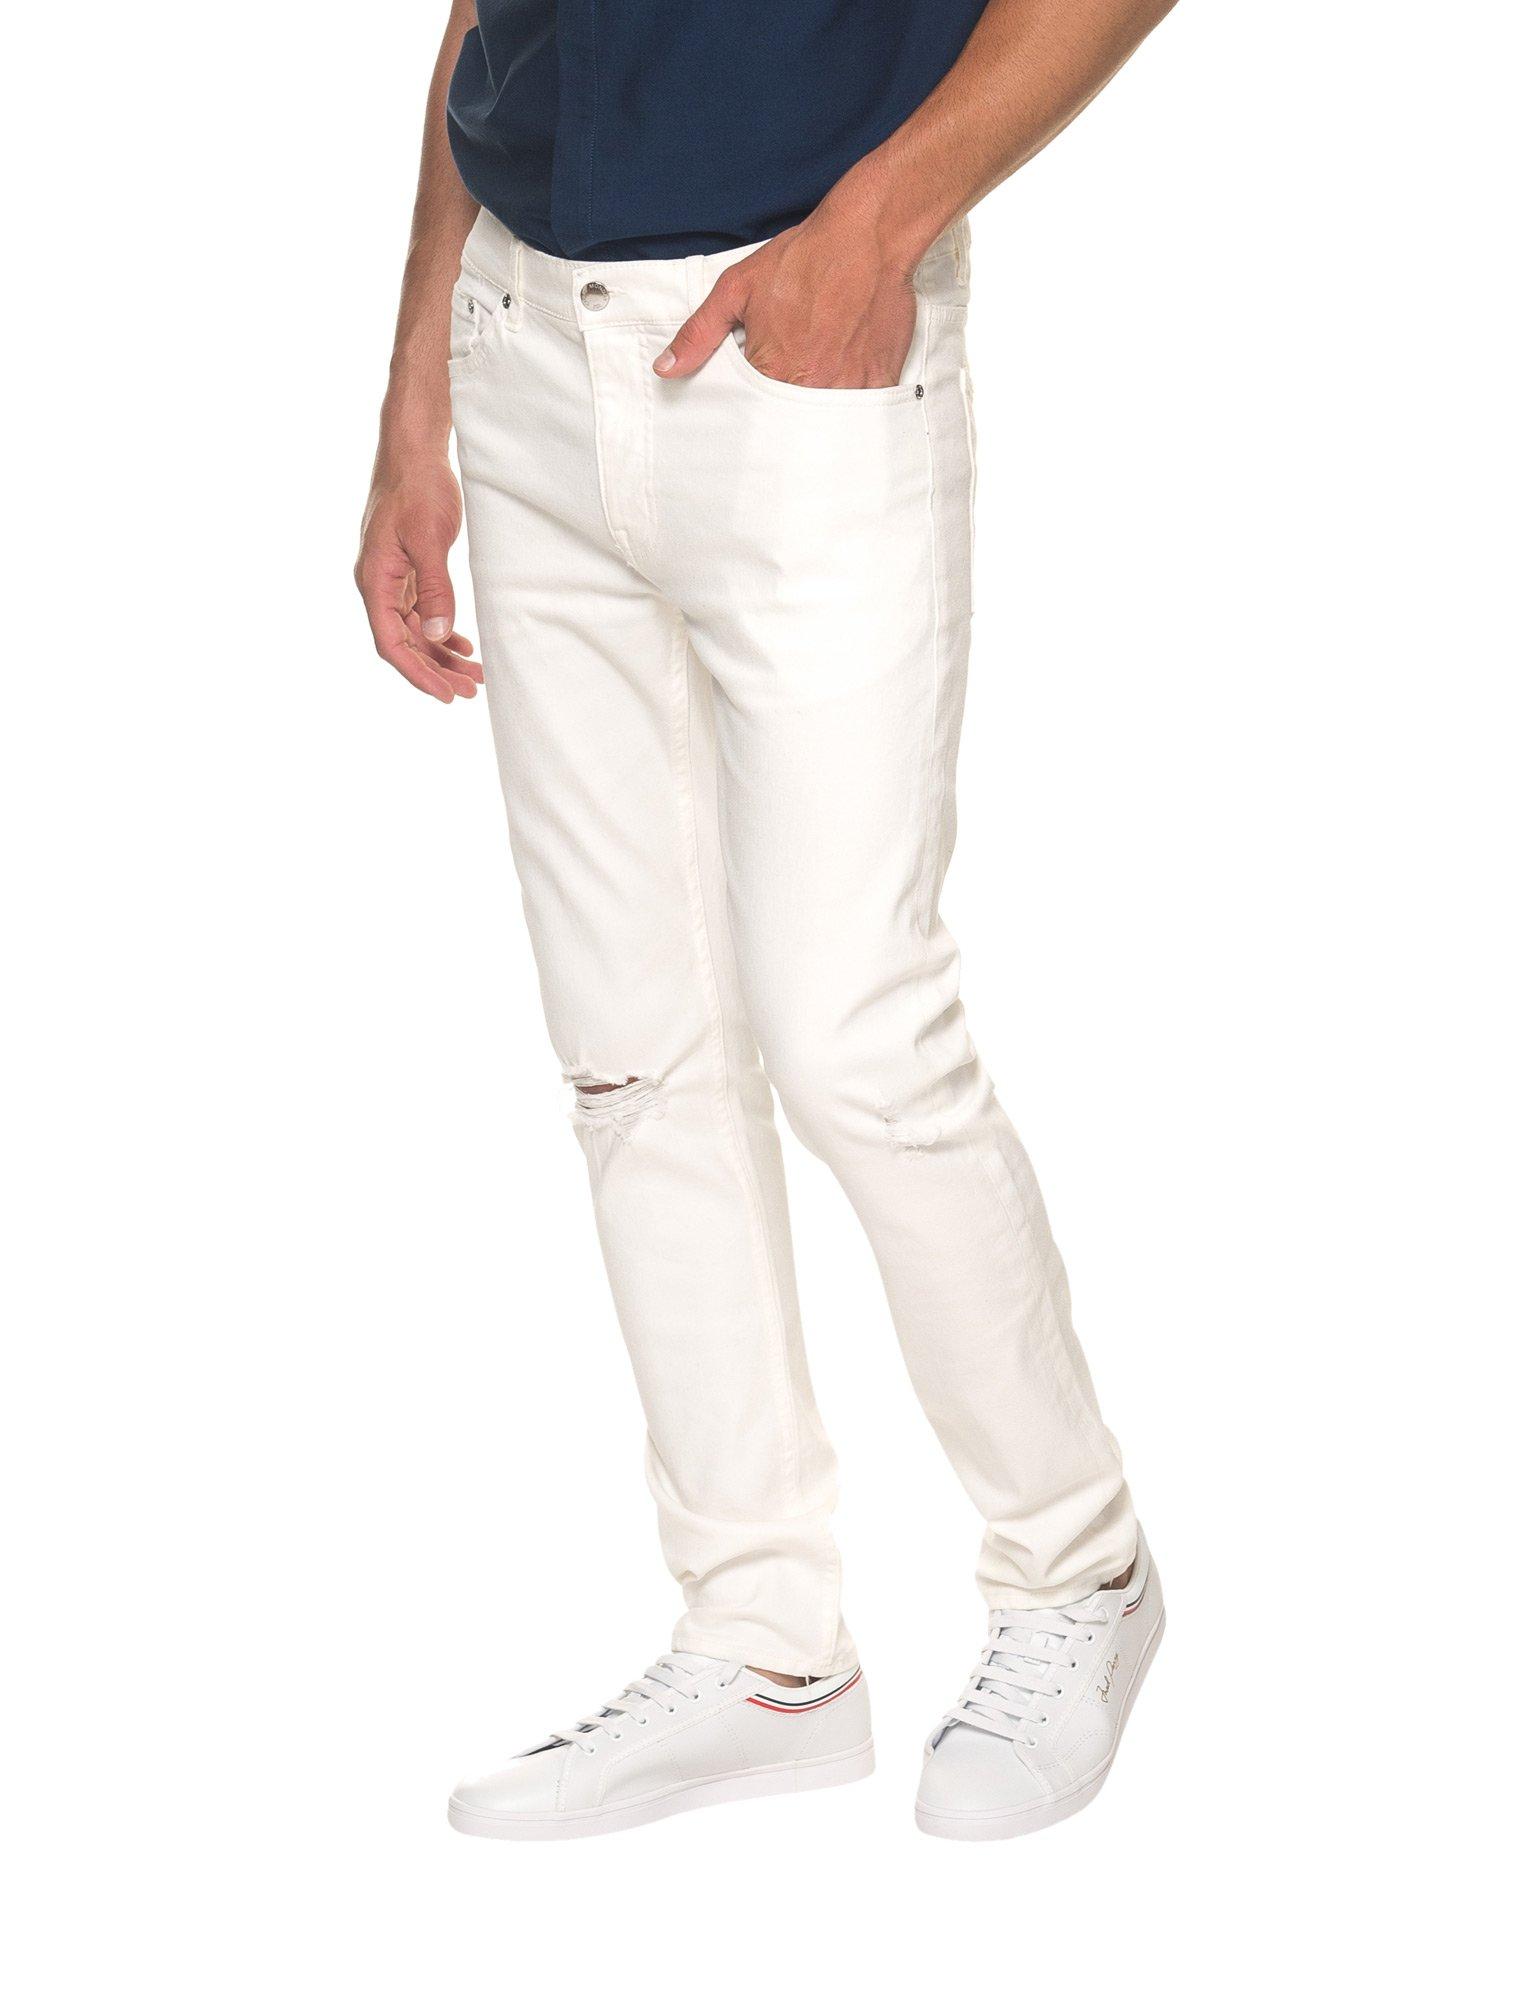 Cheap Monday Men's Sonic Men's Summer White Slim Fit Jeans in Size 31-32 White